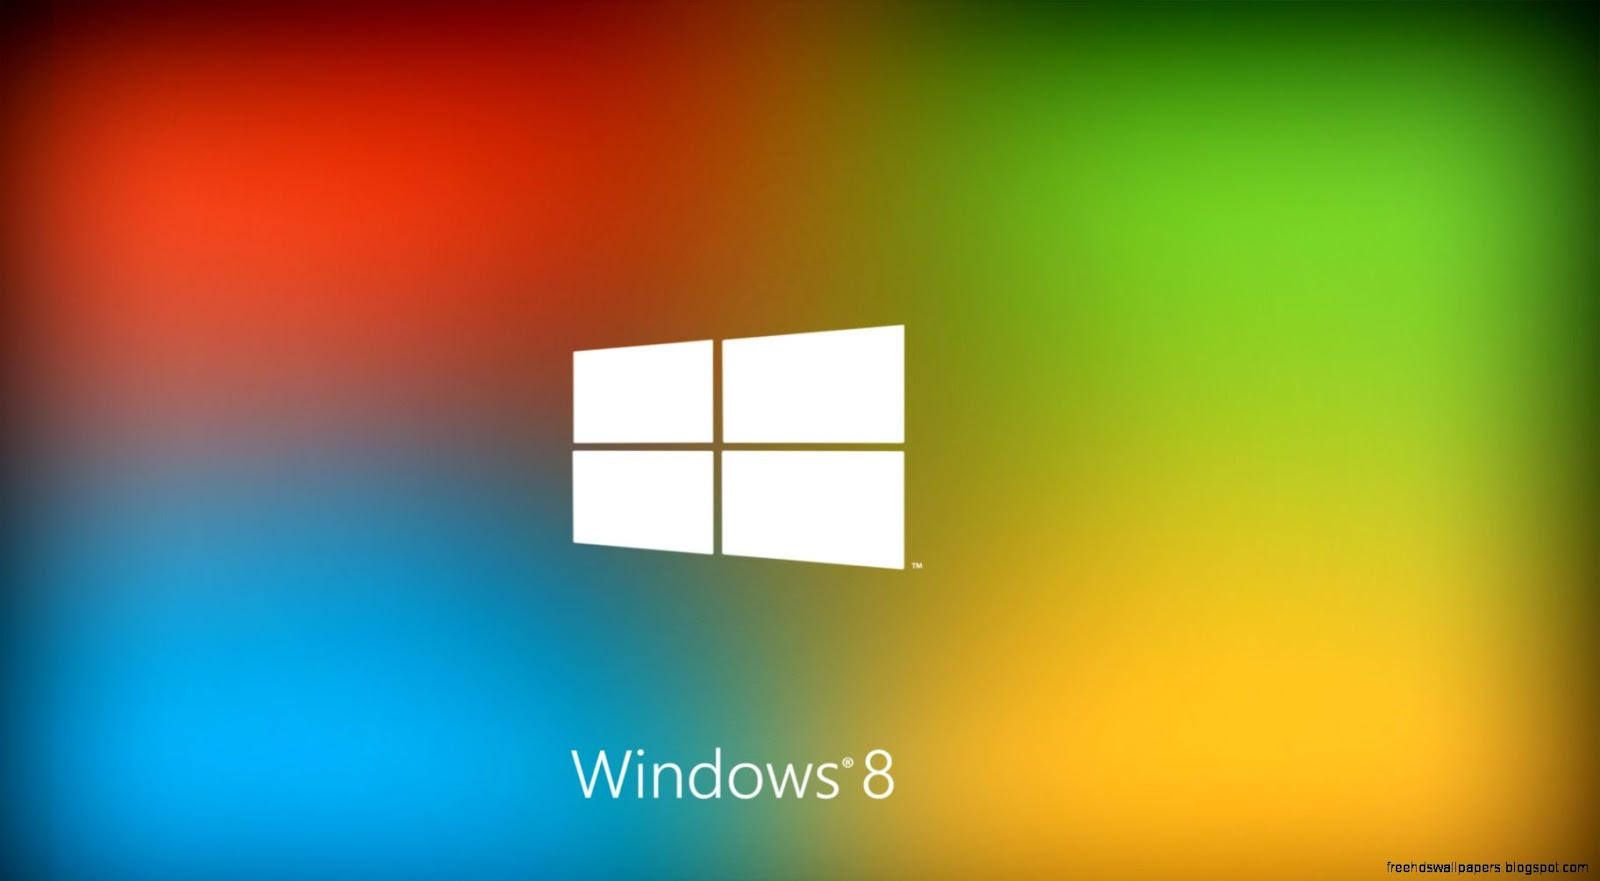 Windows 8 Wallpaper Pack